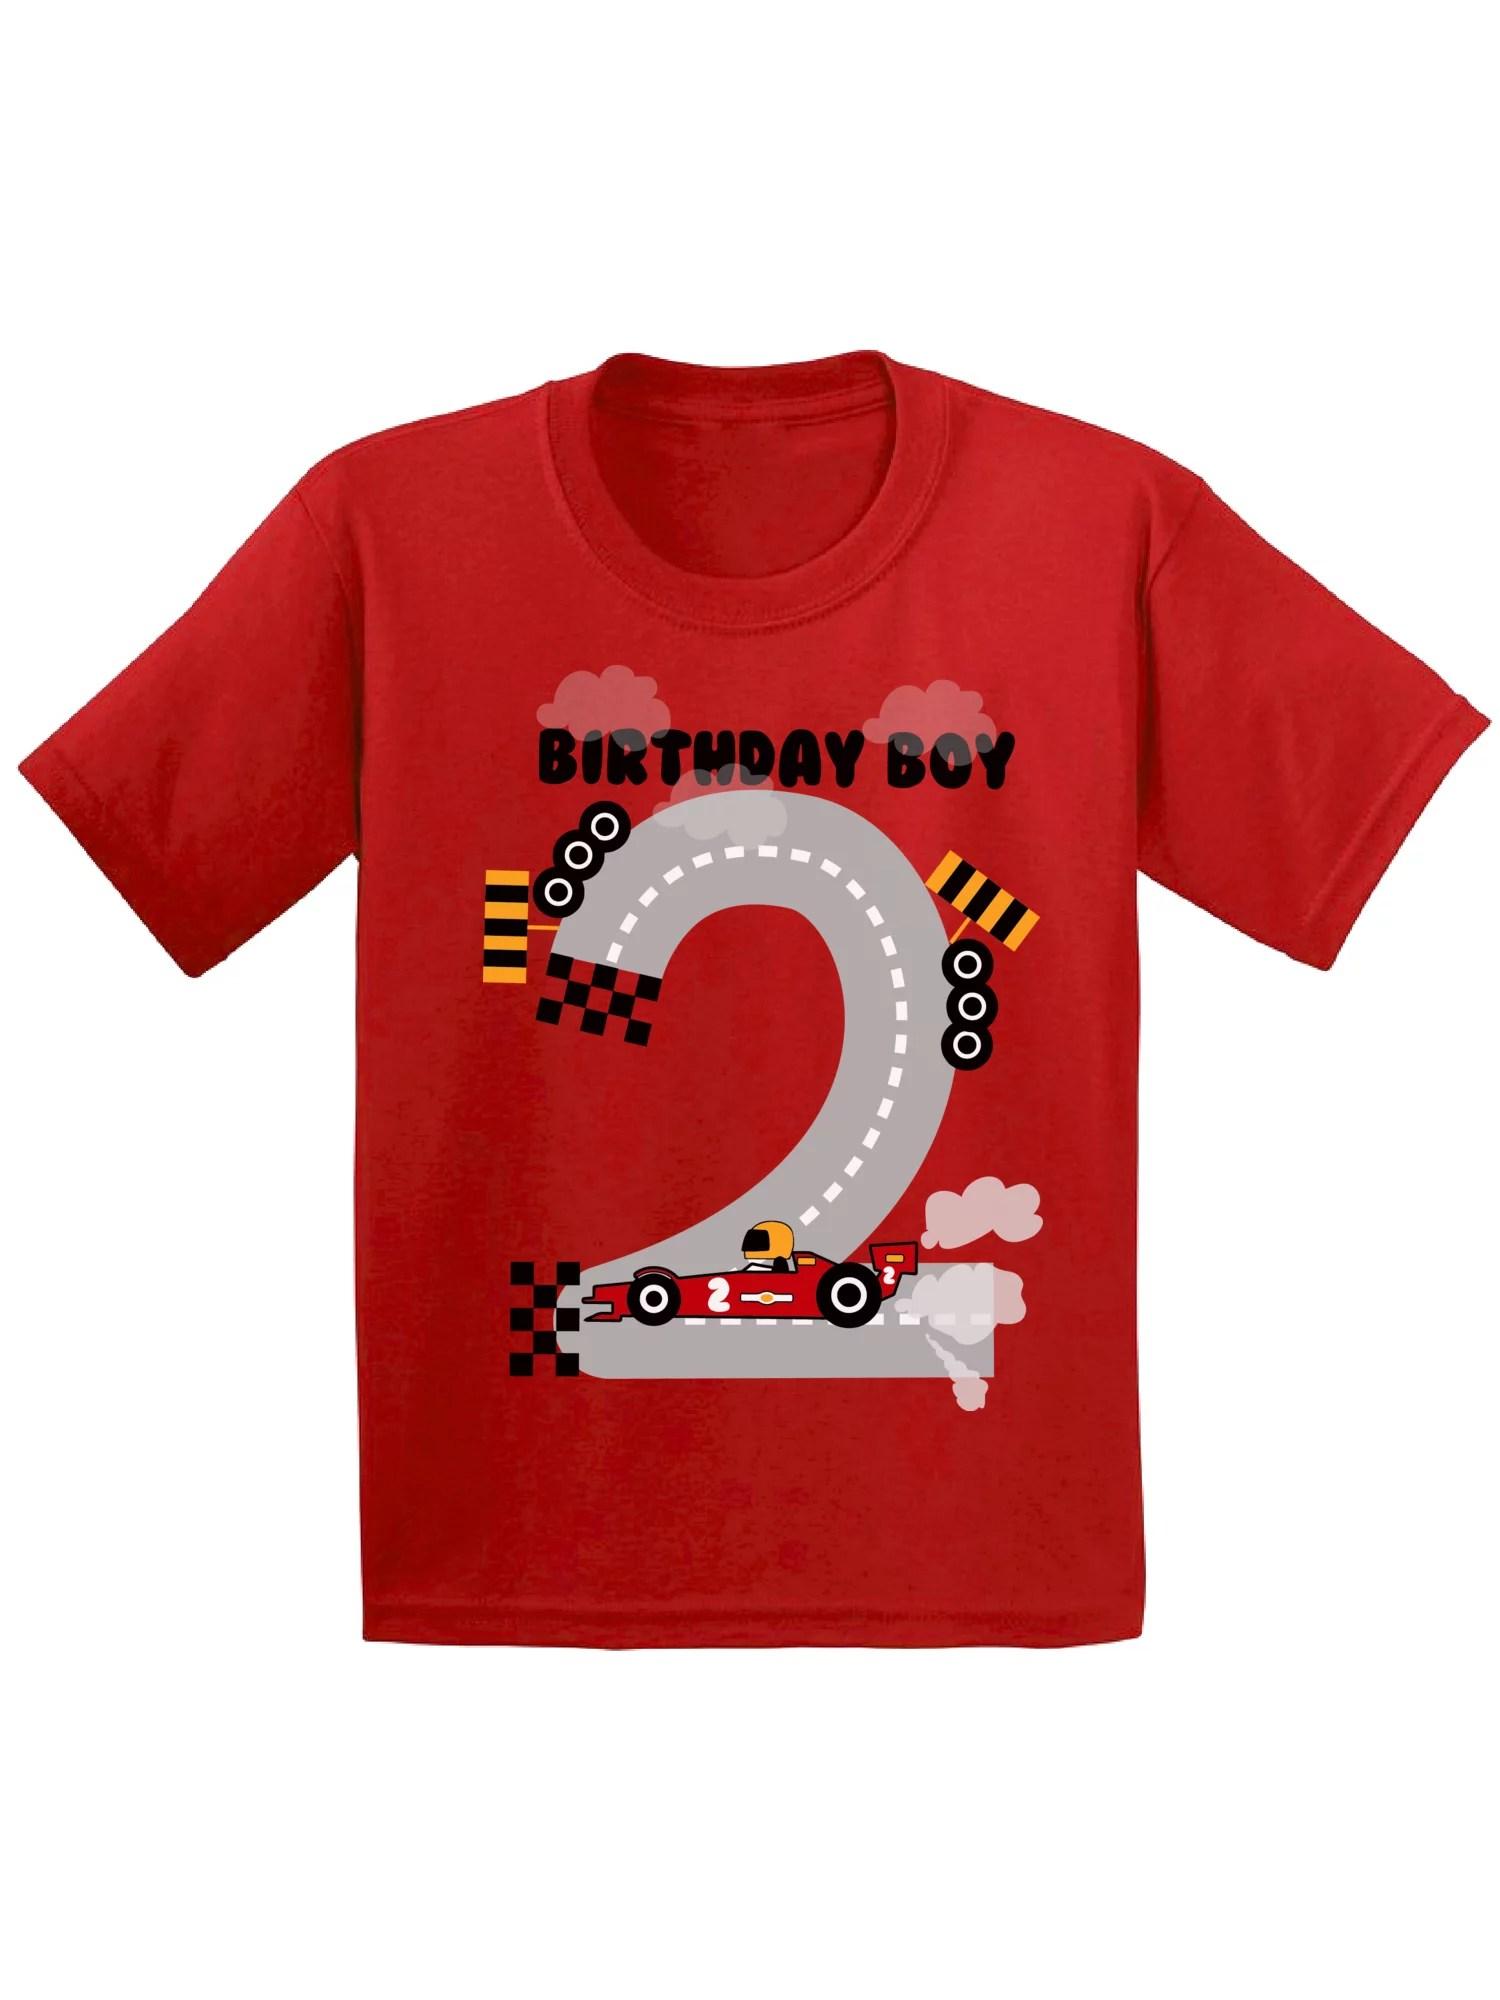 Awkward Styles Awkward Styles Birthday Boy Race Car Infant Shirt Birthday Gifts For 2 Year Old Baby Boy Race Car Birthday Party For Boys 2nd Birthday Tshirt For Baby Second Birthday